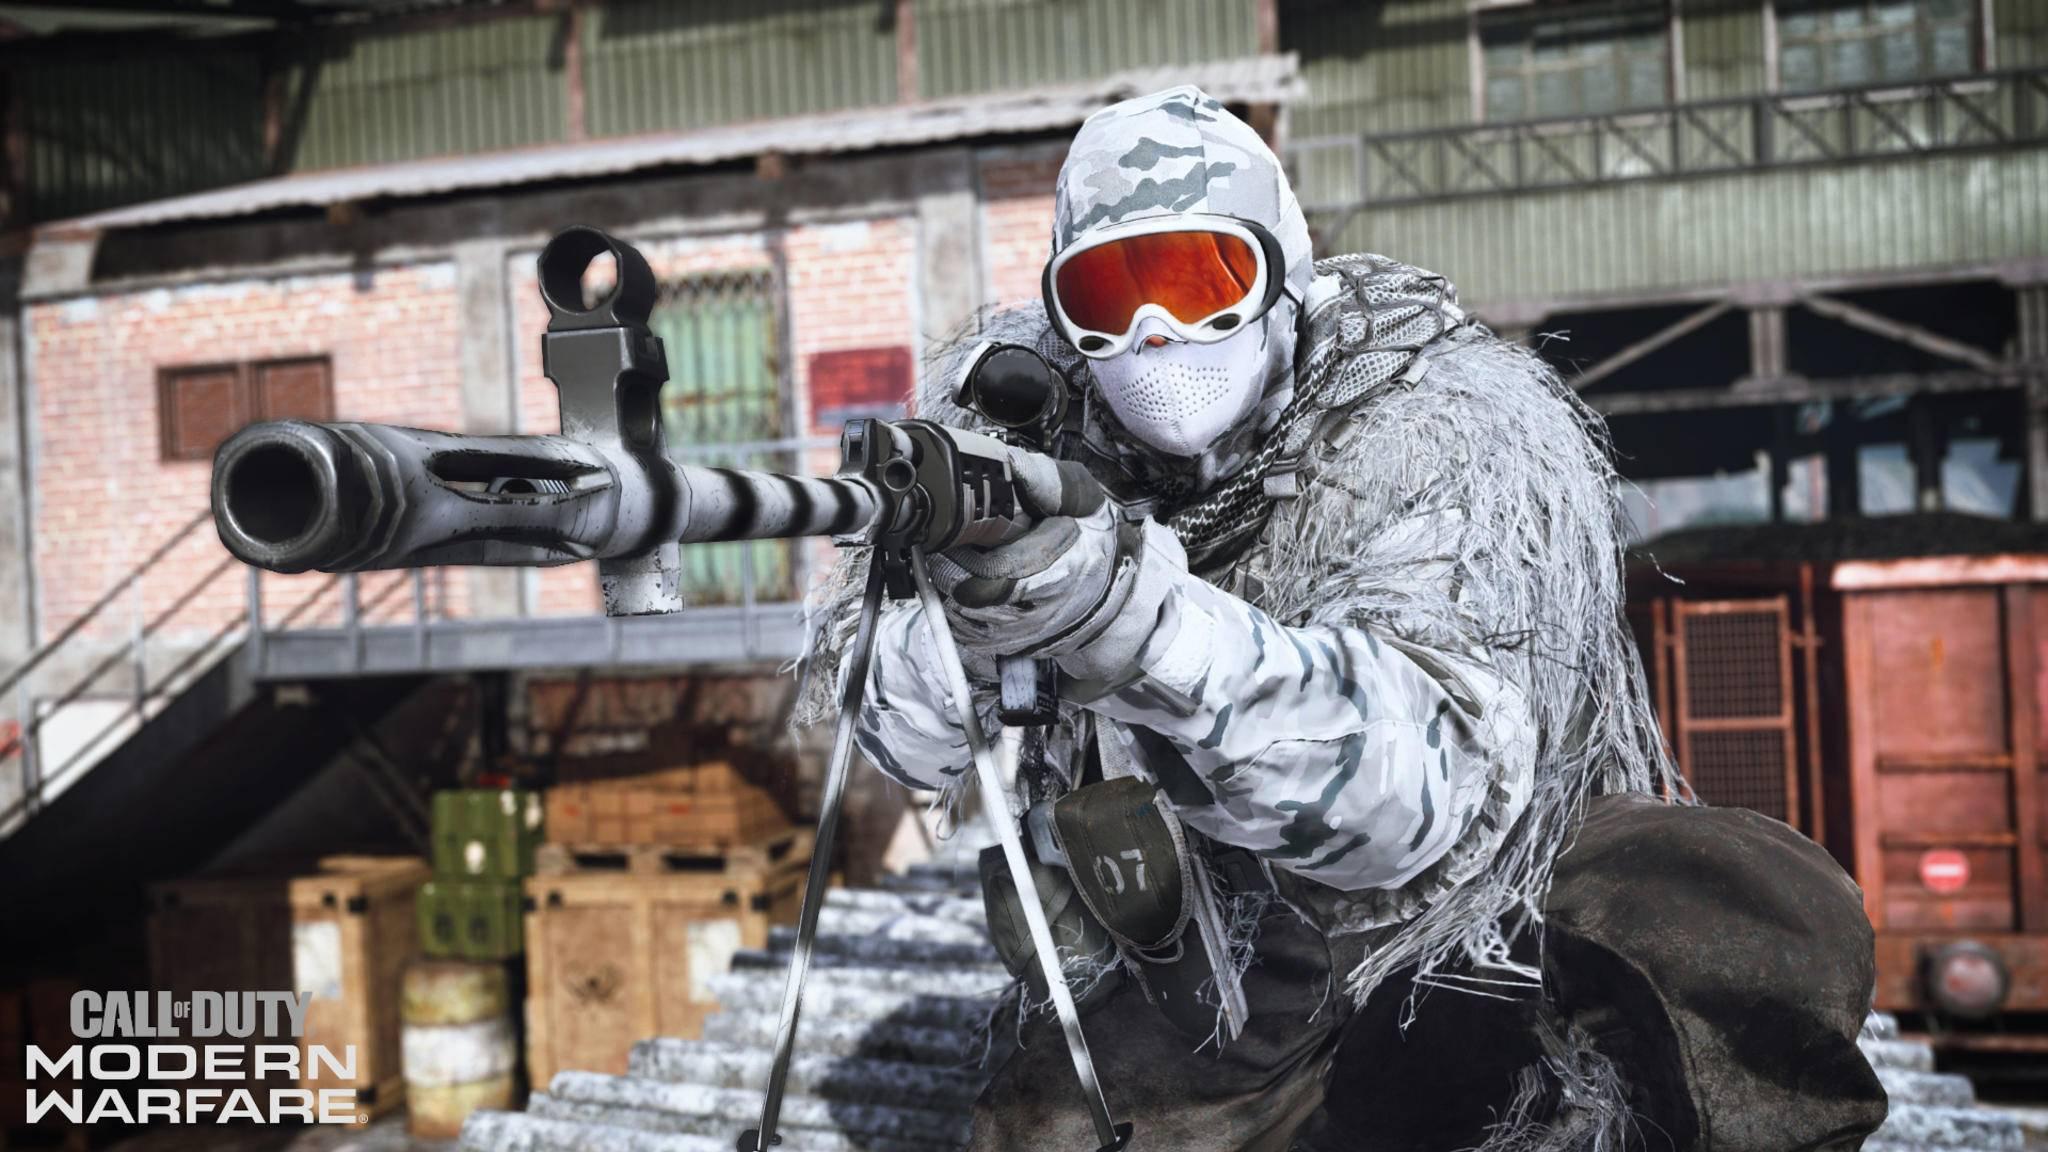 call-of-duty-modern-warfare-sniper-schnee